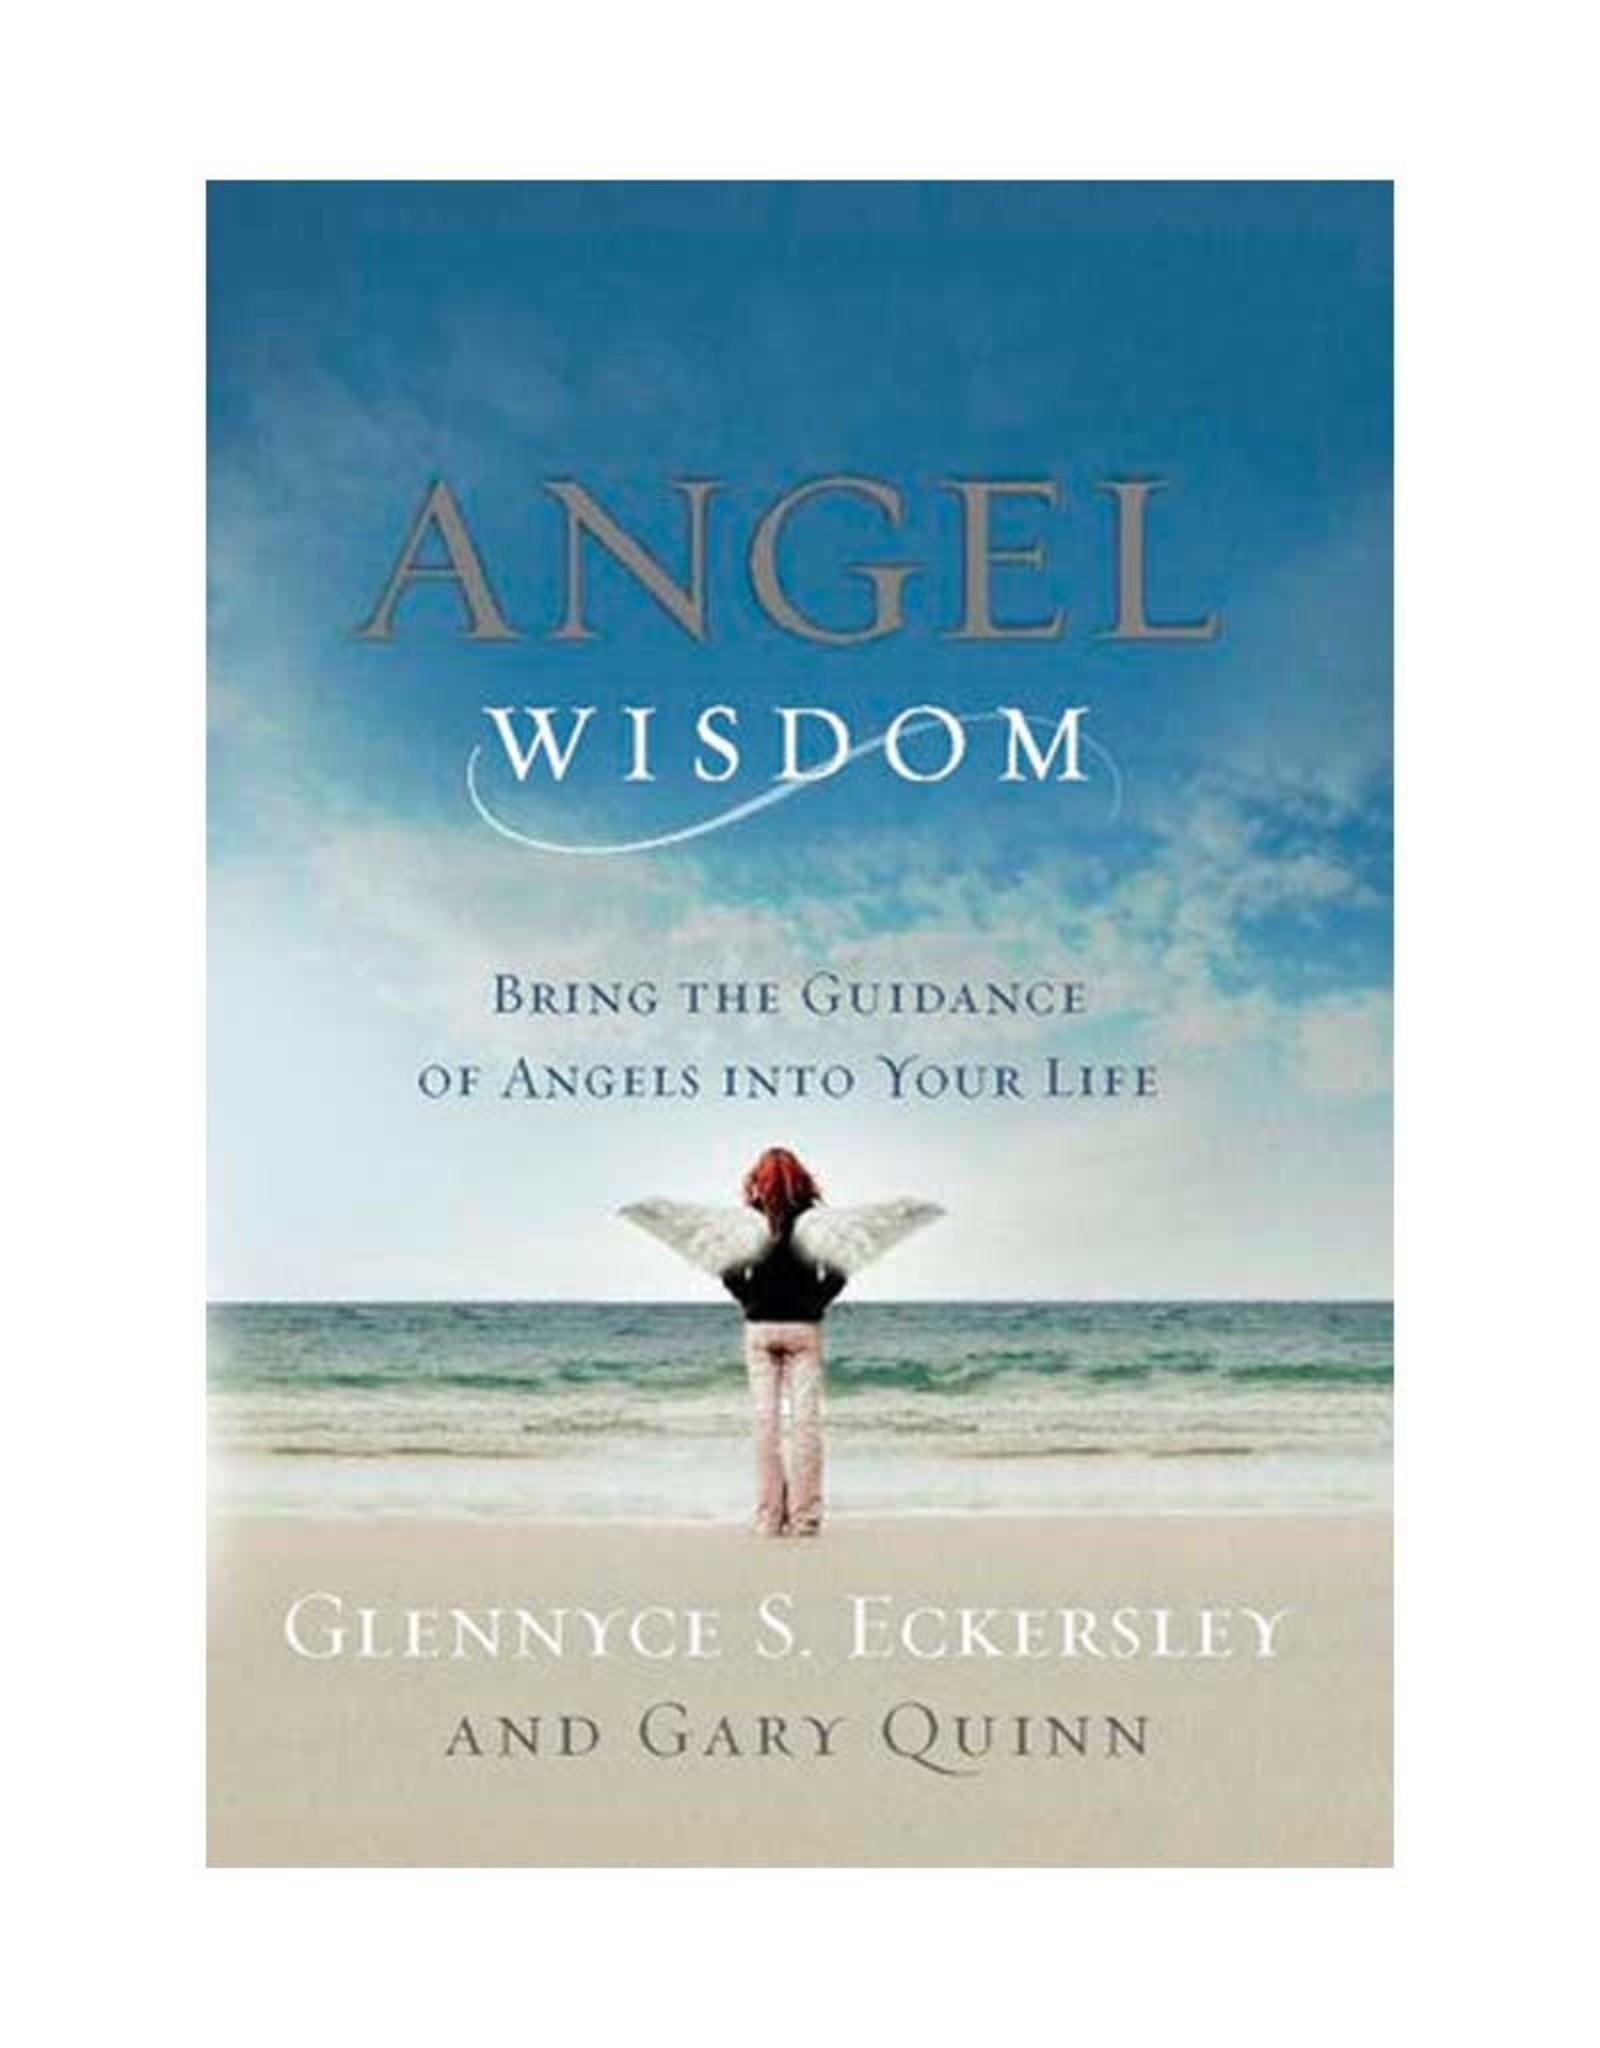 Glennyce S. Eckersley Angel Wisdom by Glennyce S. Eckersley & Gary Quinn